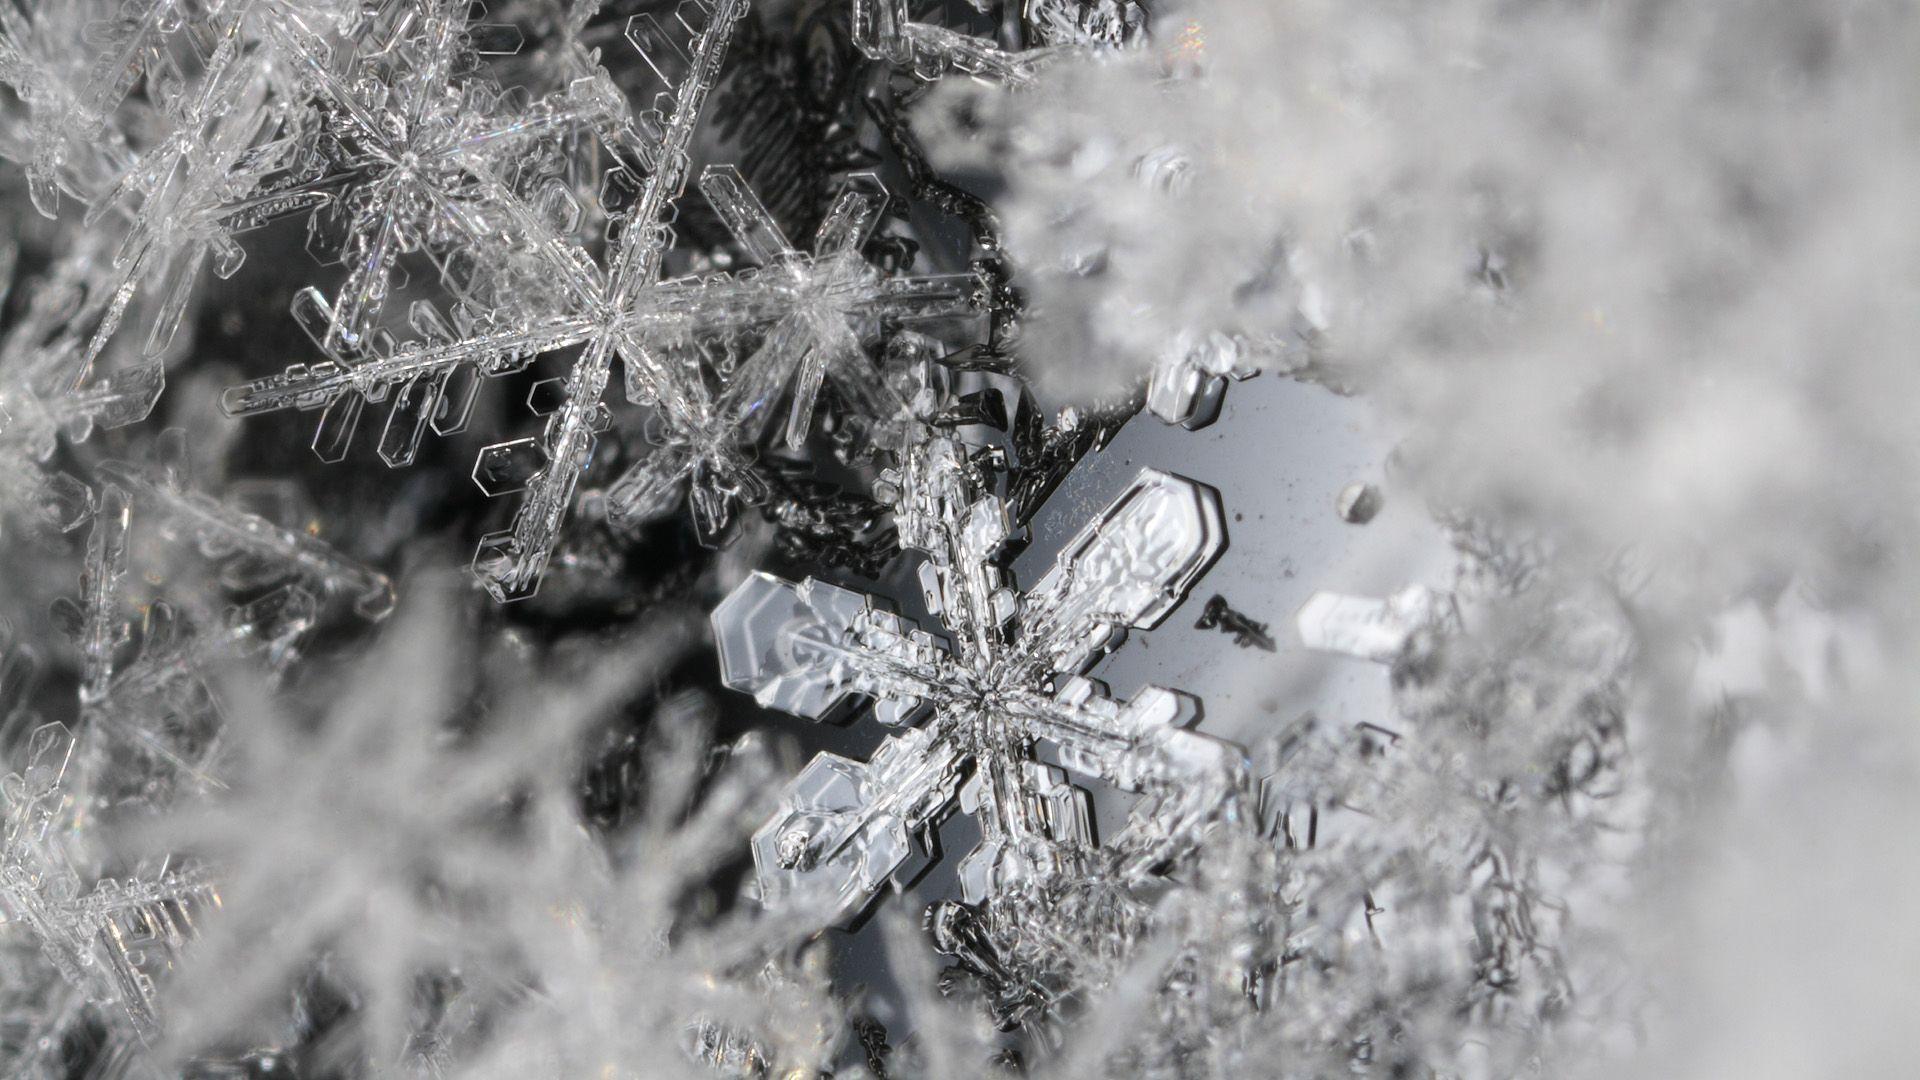 Snowflake Desktop Wallpapers - Wallpaper Cave |Real Snowflakes Background